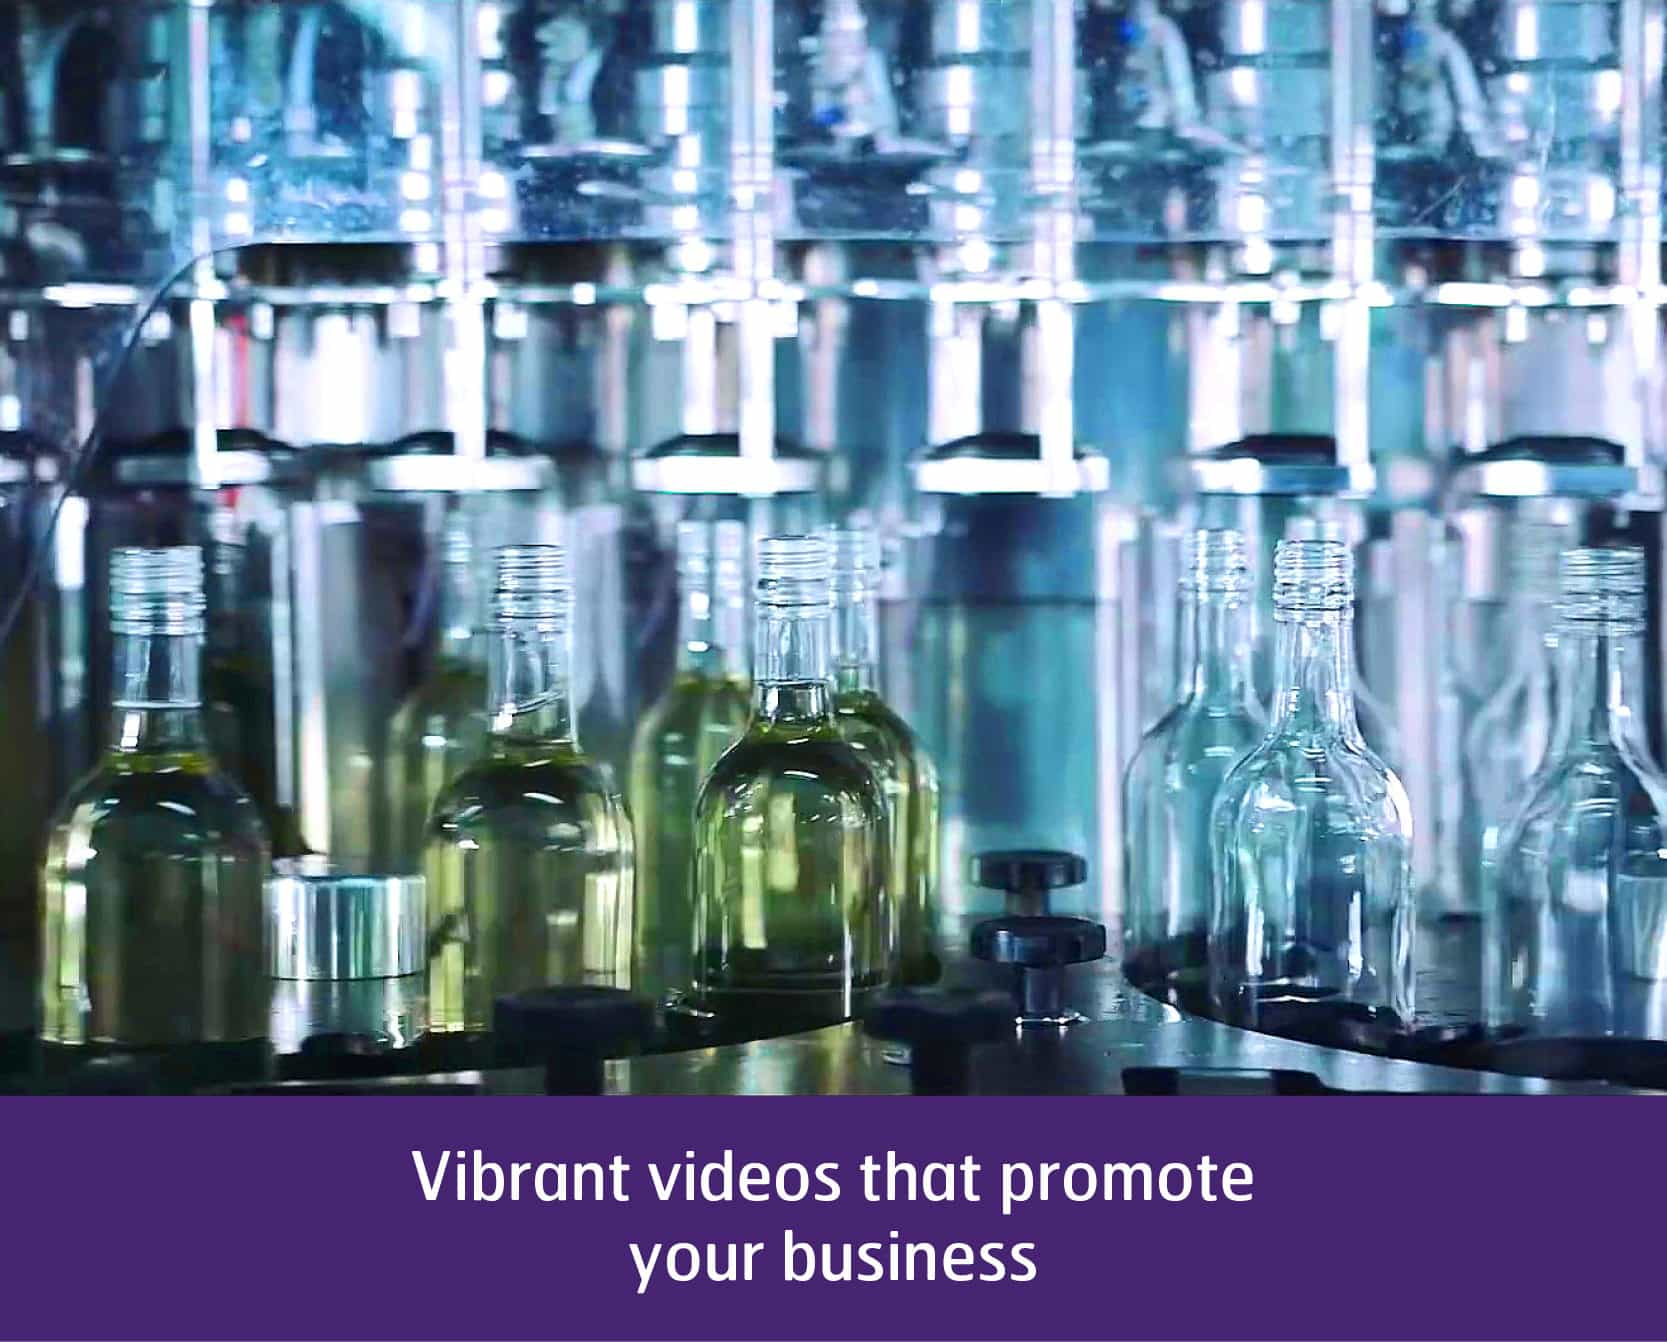 Video of wine bottles in factory